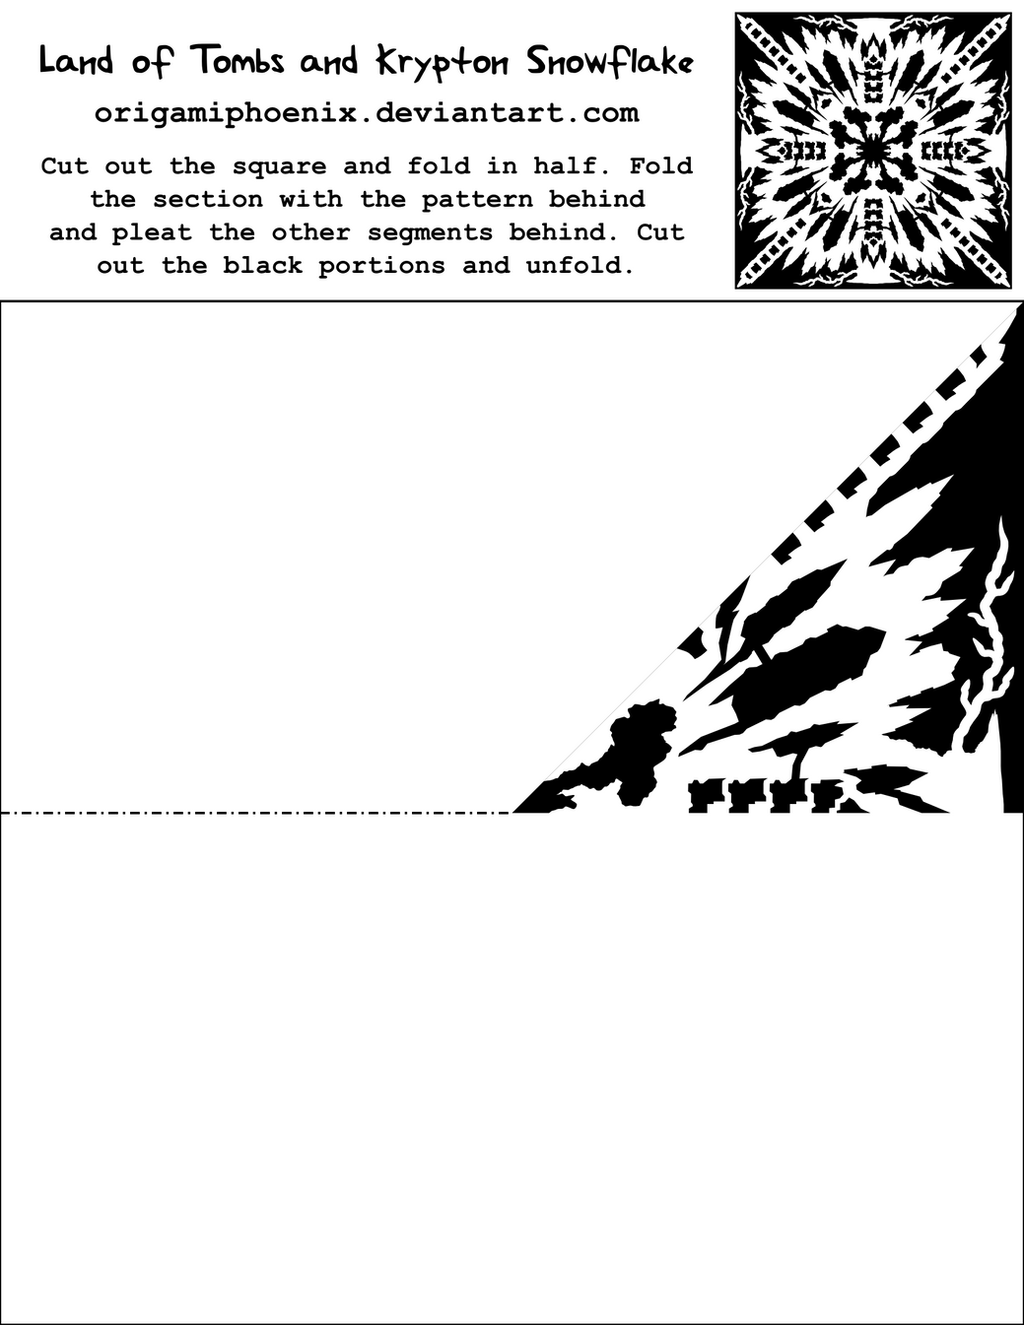 LOTAK Snowflake PrintOut by OrigamiPhoenix on DeviantArt